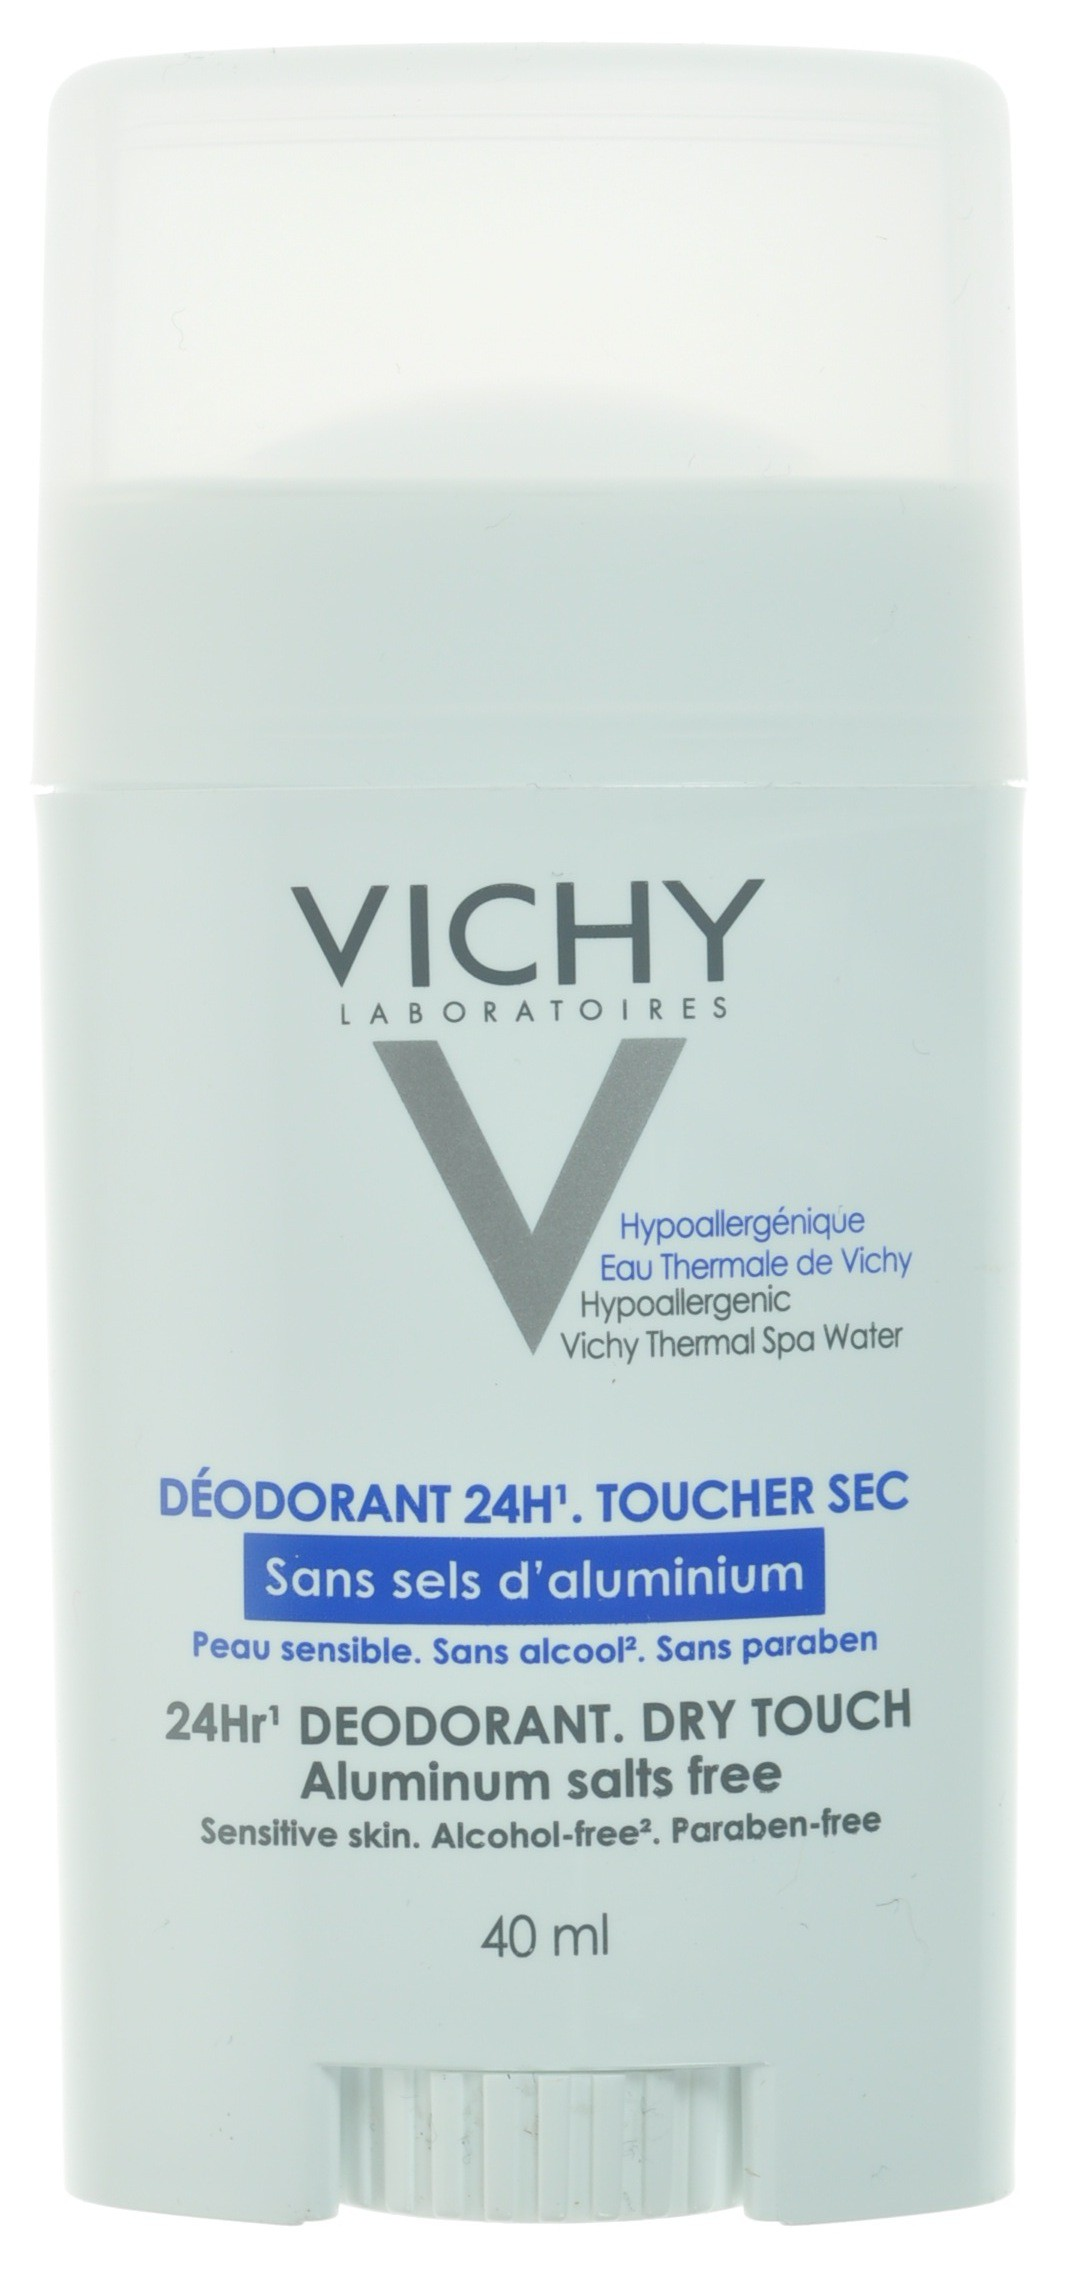 vichy deodorant stick 24h sans sel aluminium 40ml acheter en ligne. Black Bedroom Furniture Sets. Home Design Ideas